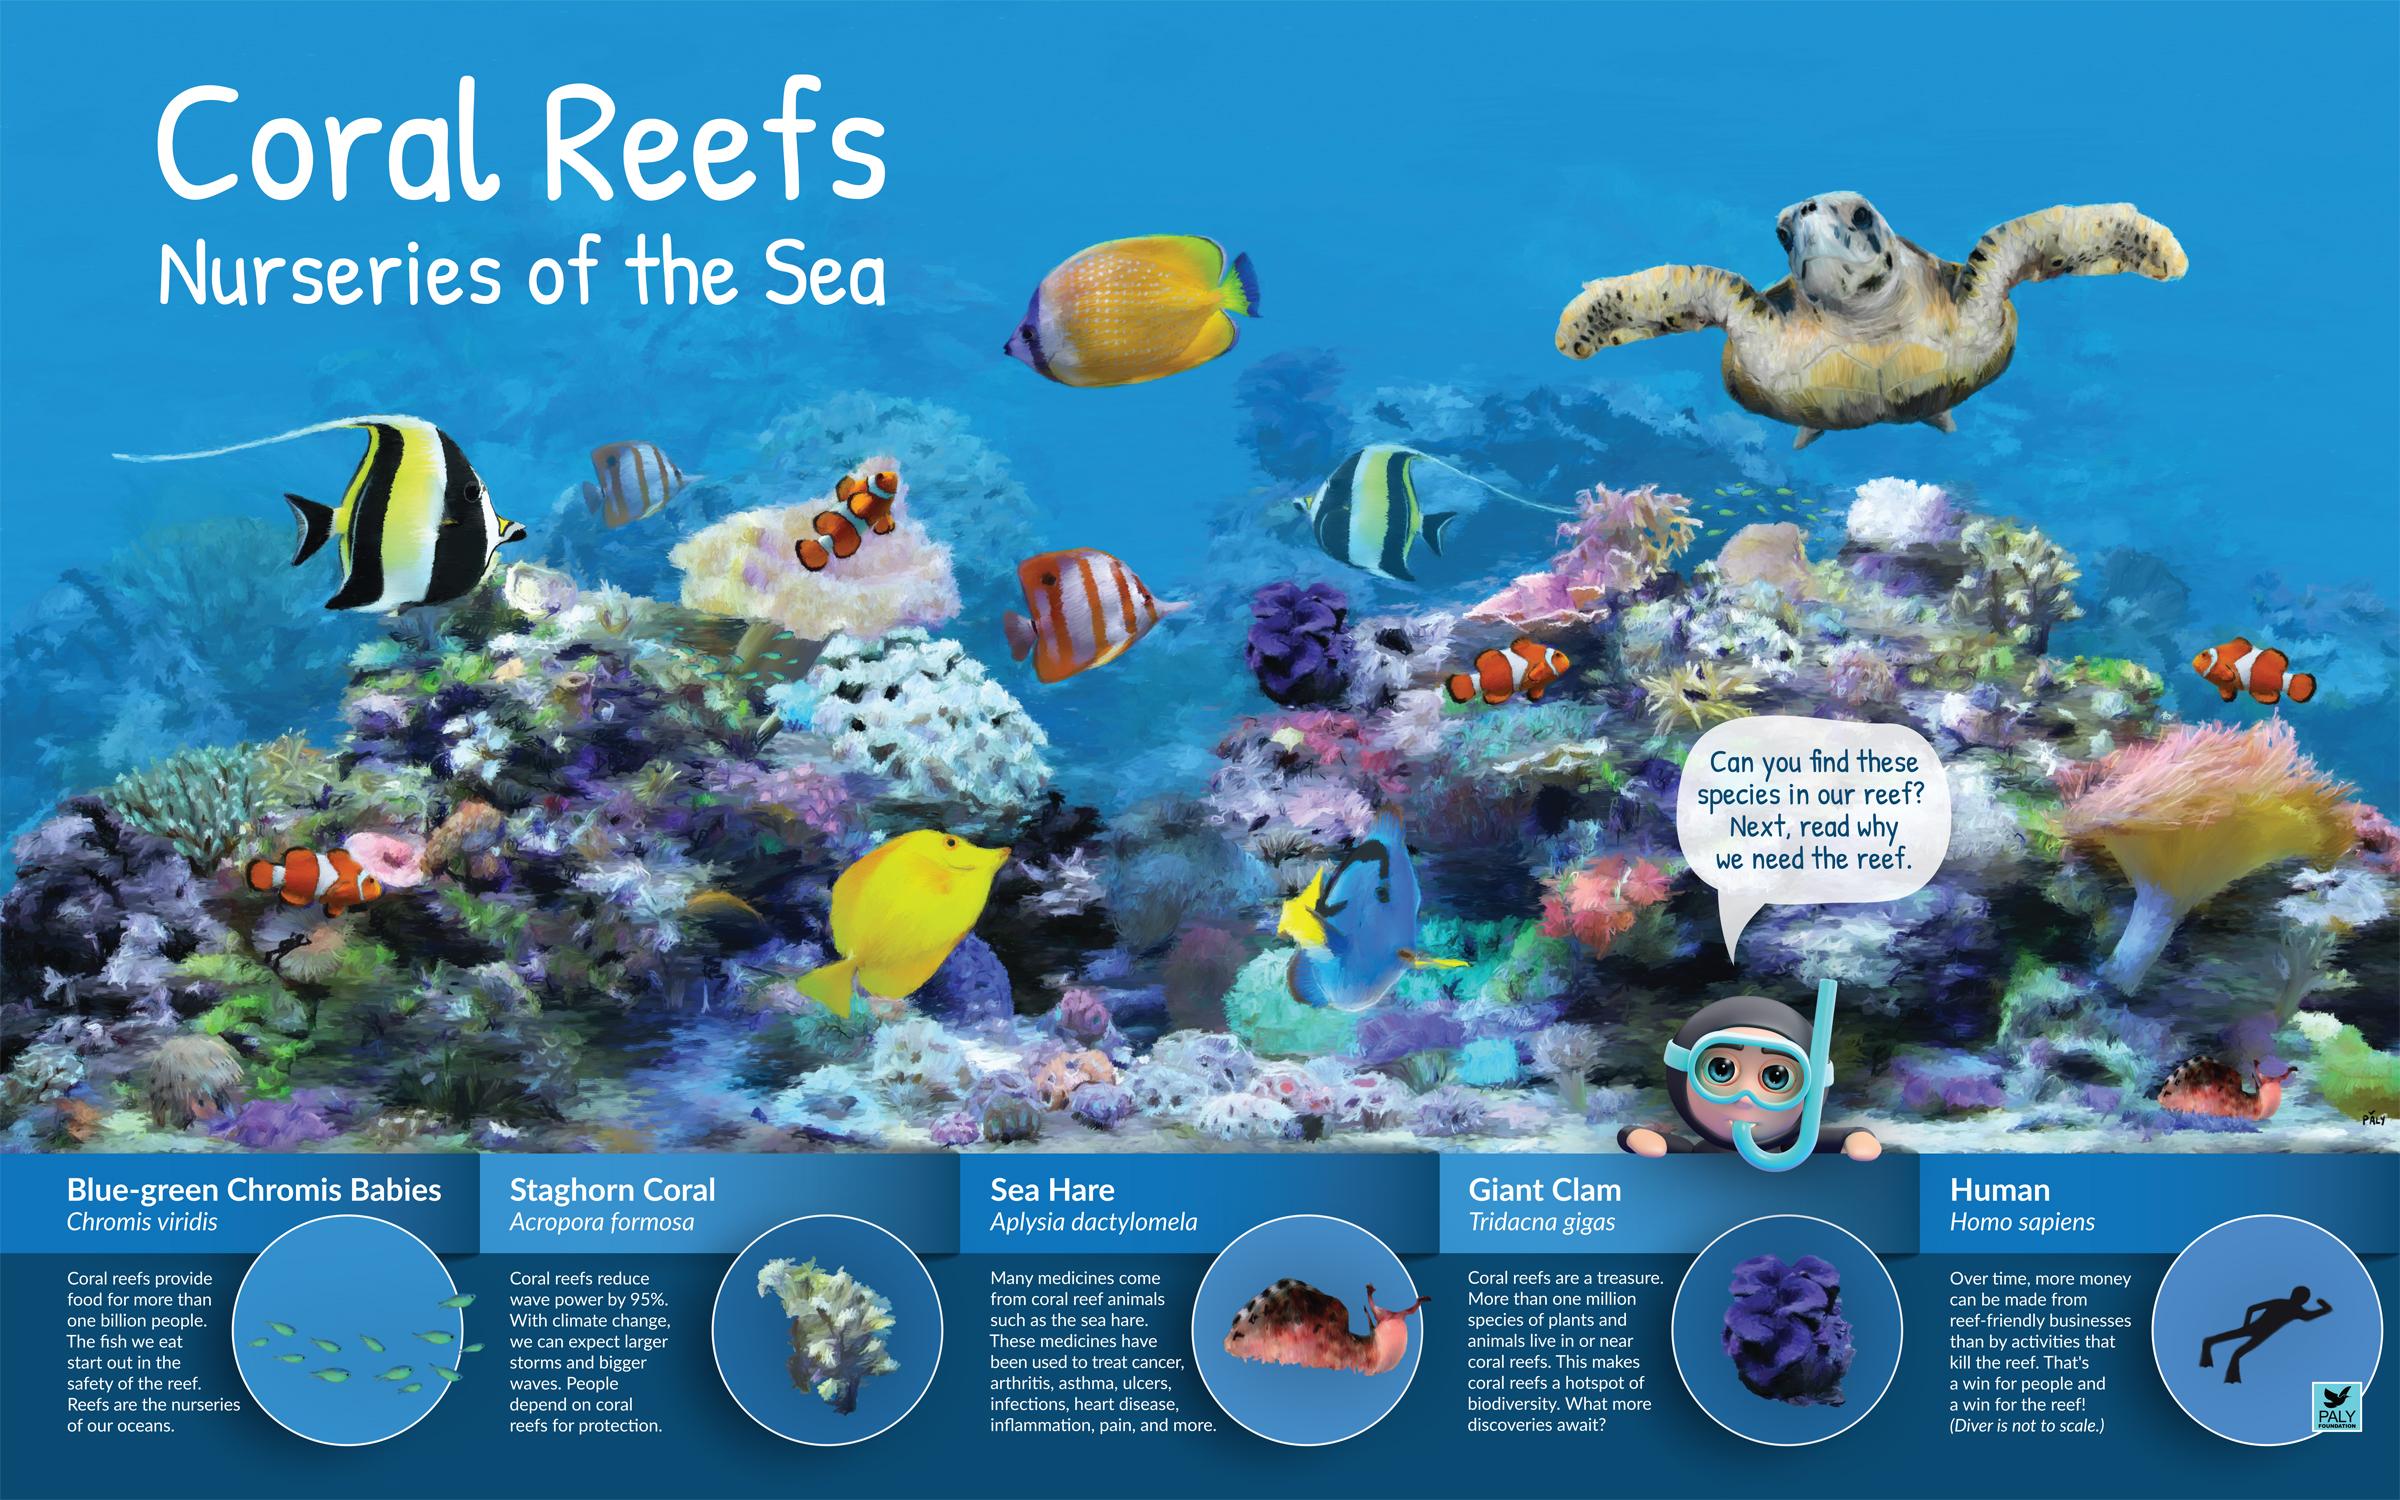 NatureExhibits Coral Reefs: Nurseries of the Sea